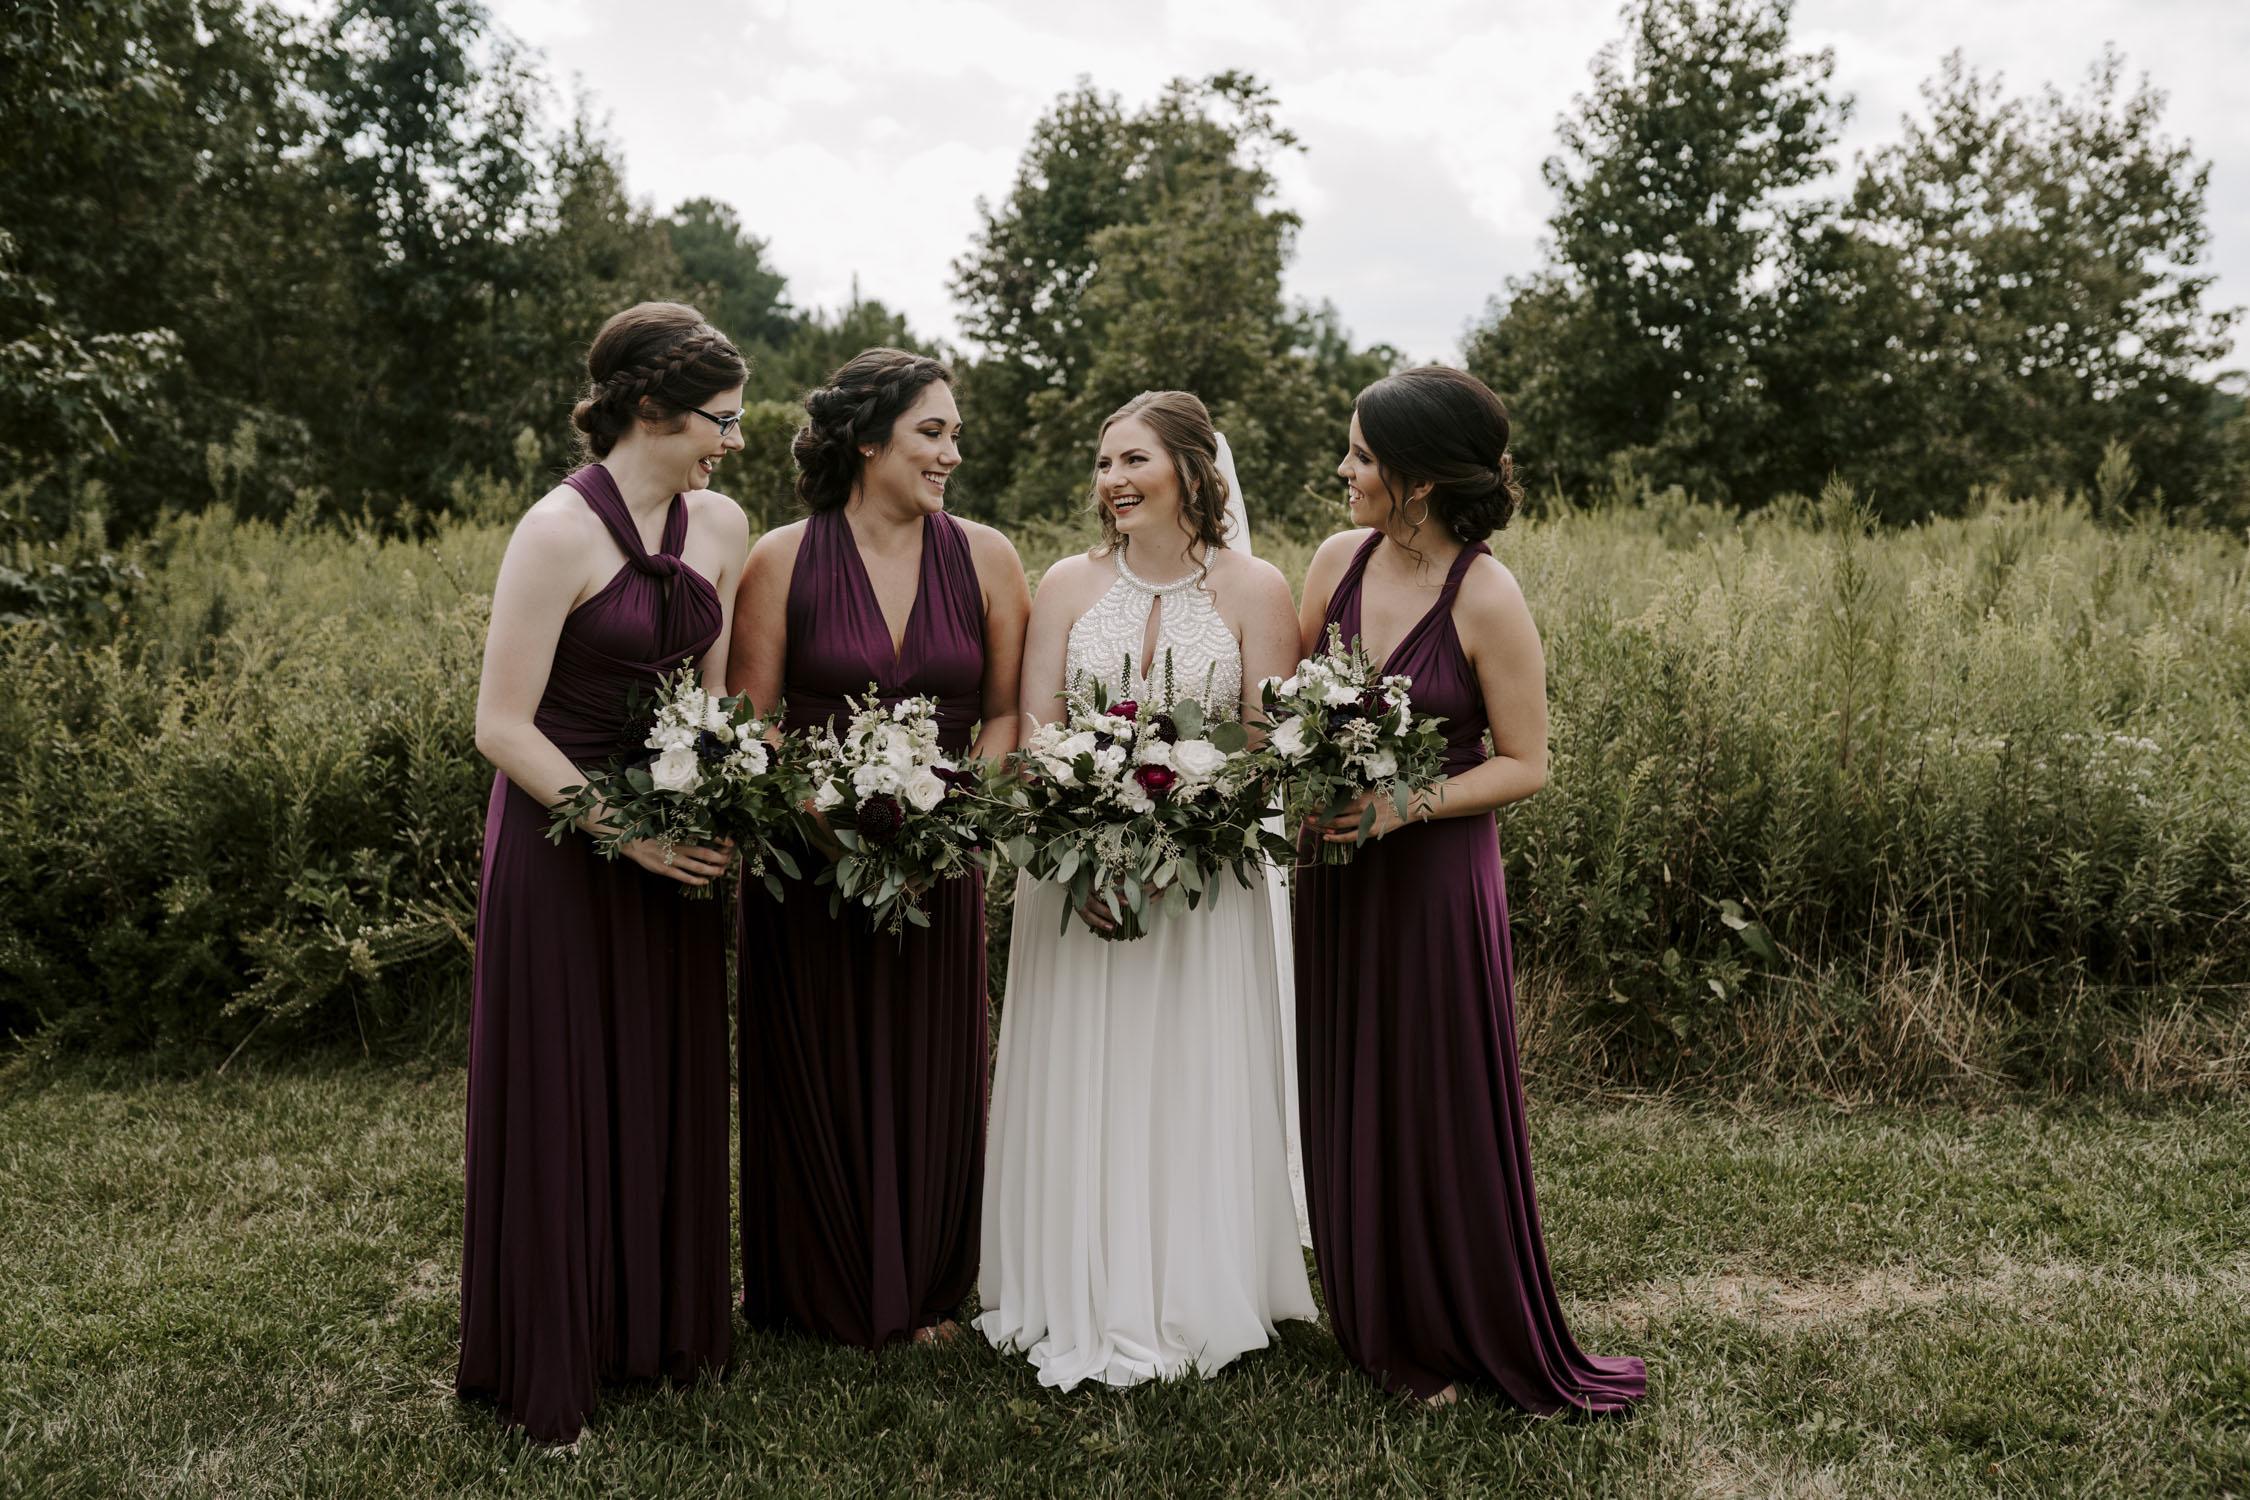 Chapel Hill Wedding Party Bridesmaids Portraits | Kayli LaFon Photography, North Carolina Intimate Wedding Photographer